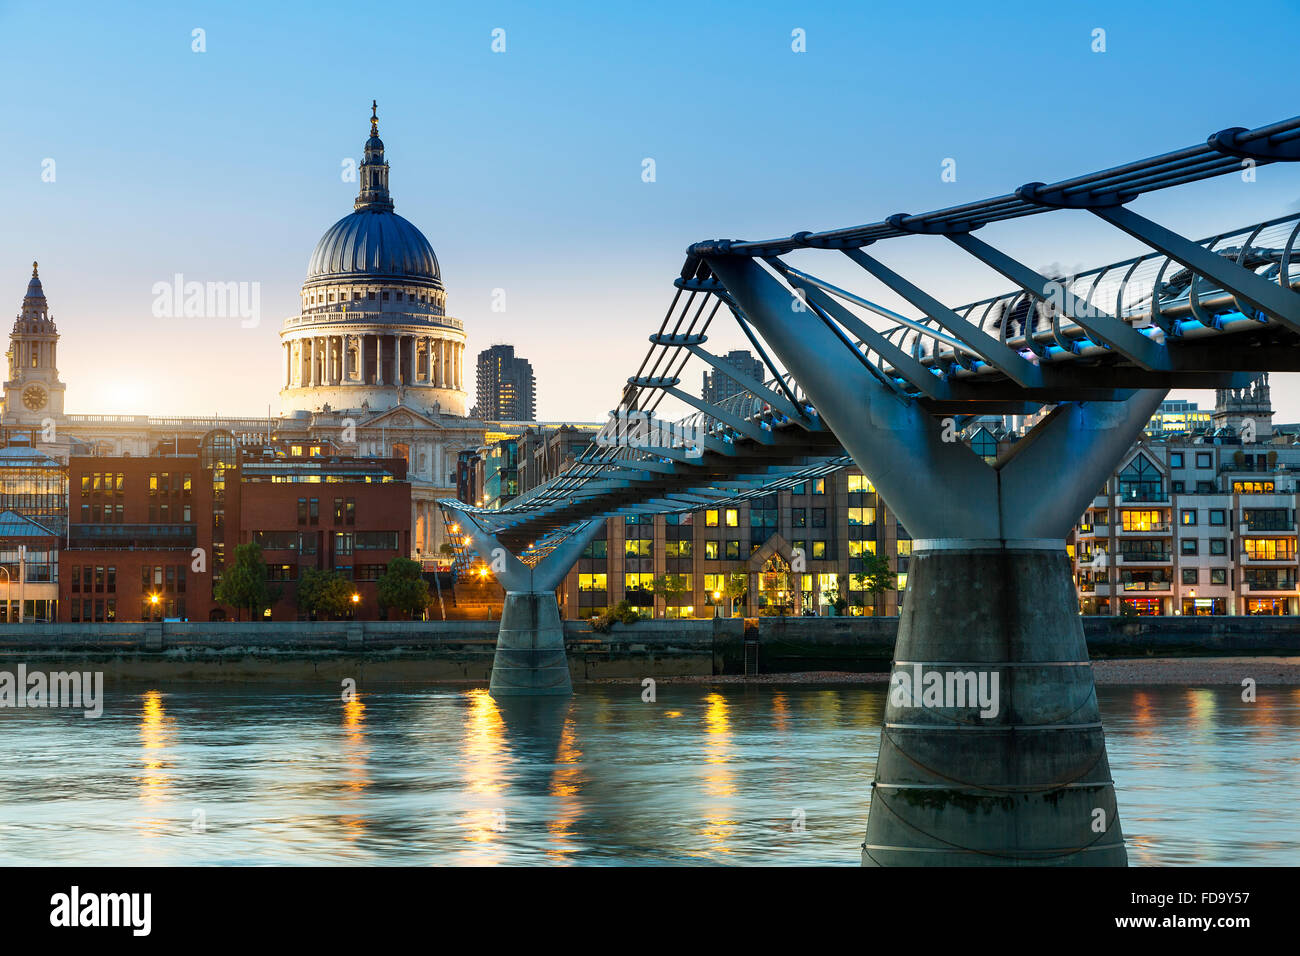 London millennium Footbridge at dusk - Stock Image